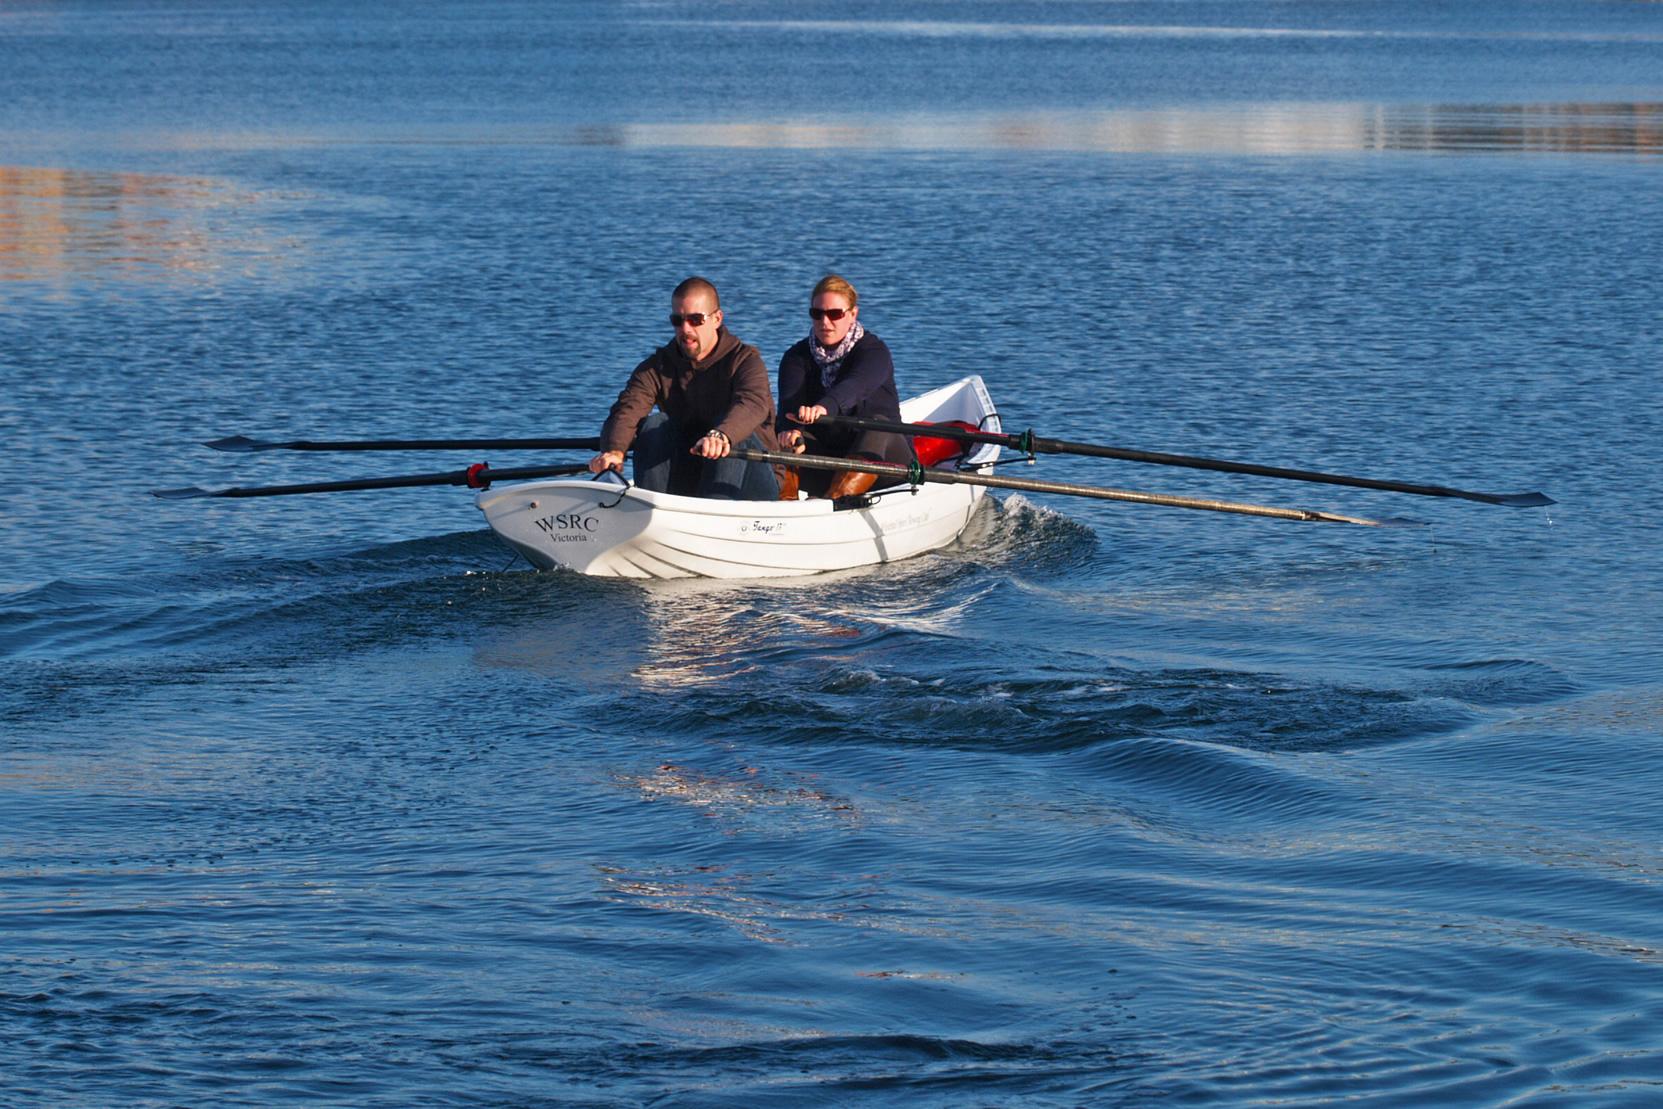 Triathletes-Need-to-Row-Tango-17-Rowboat-Whitehall-Rowing-and-Sail-1663x1109